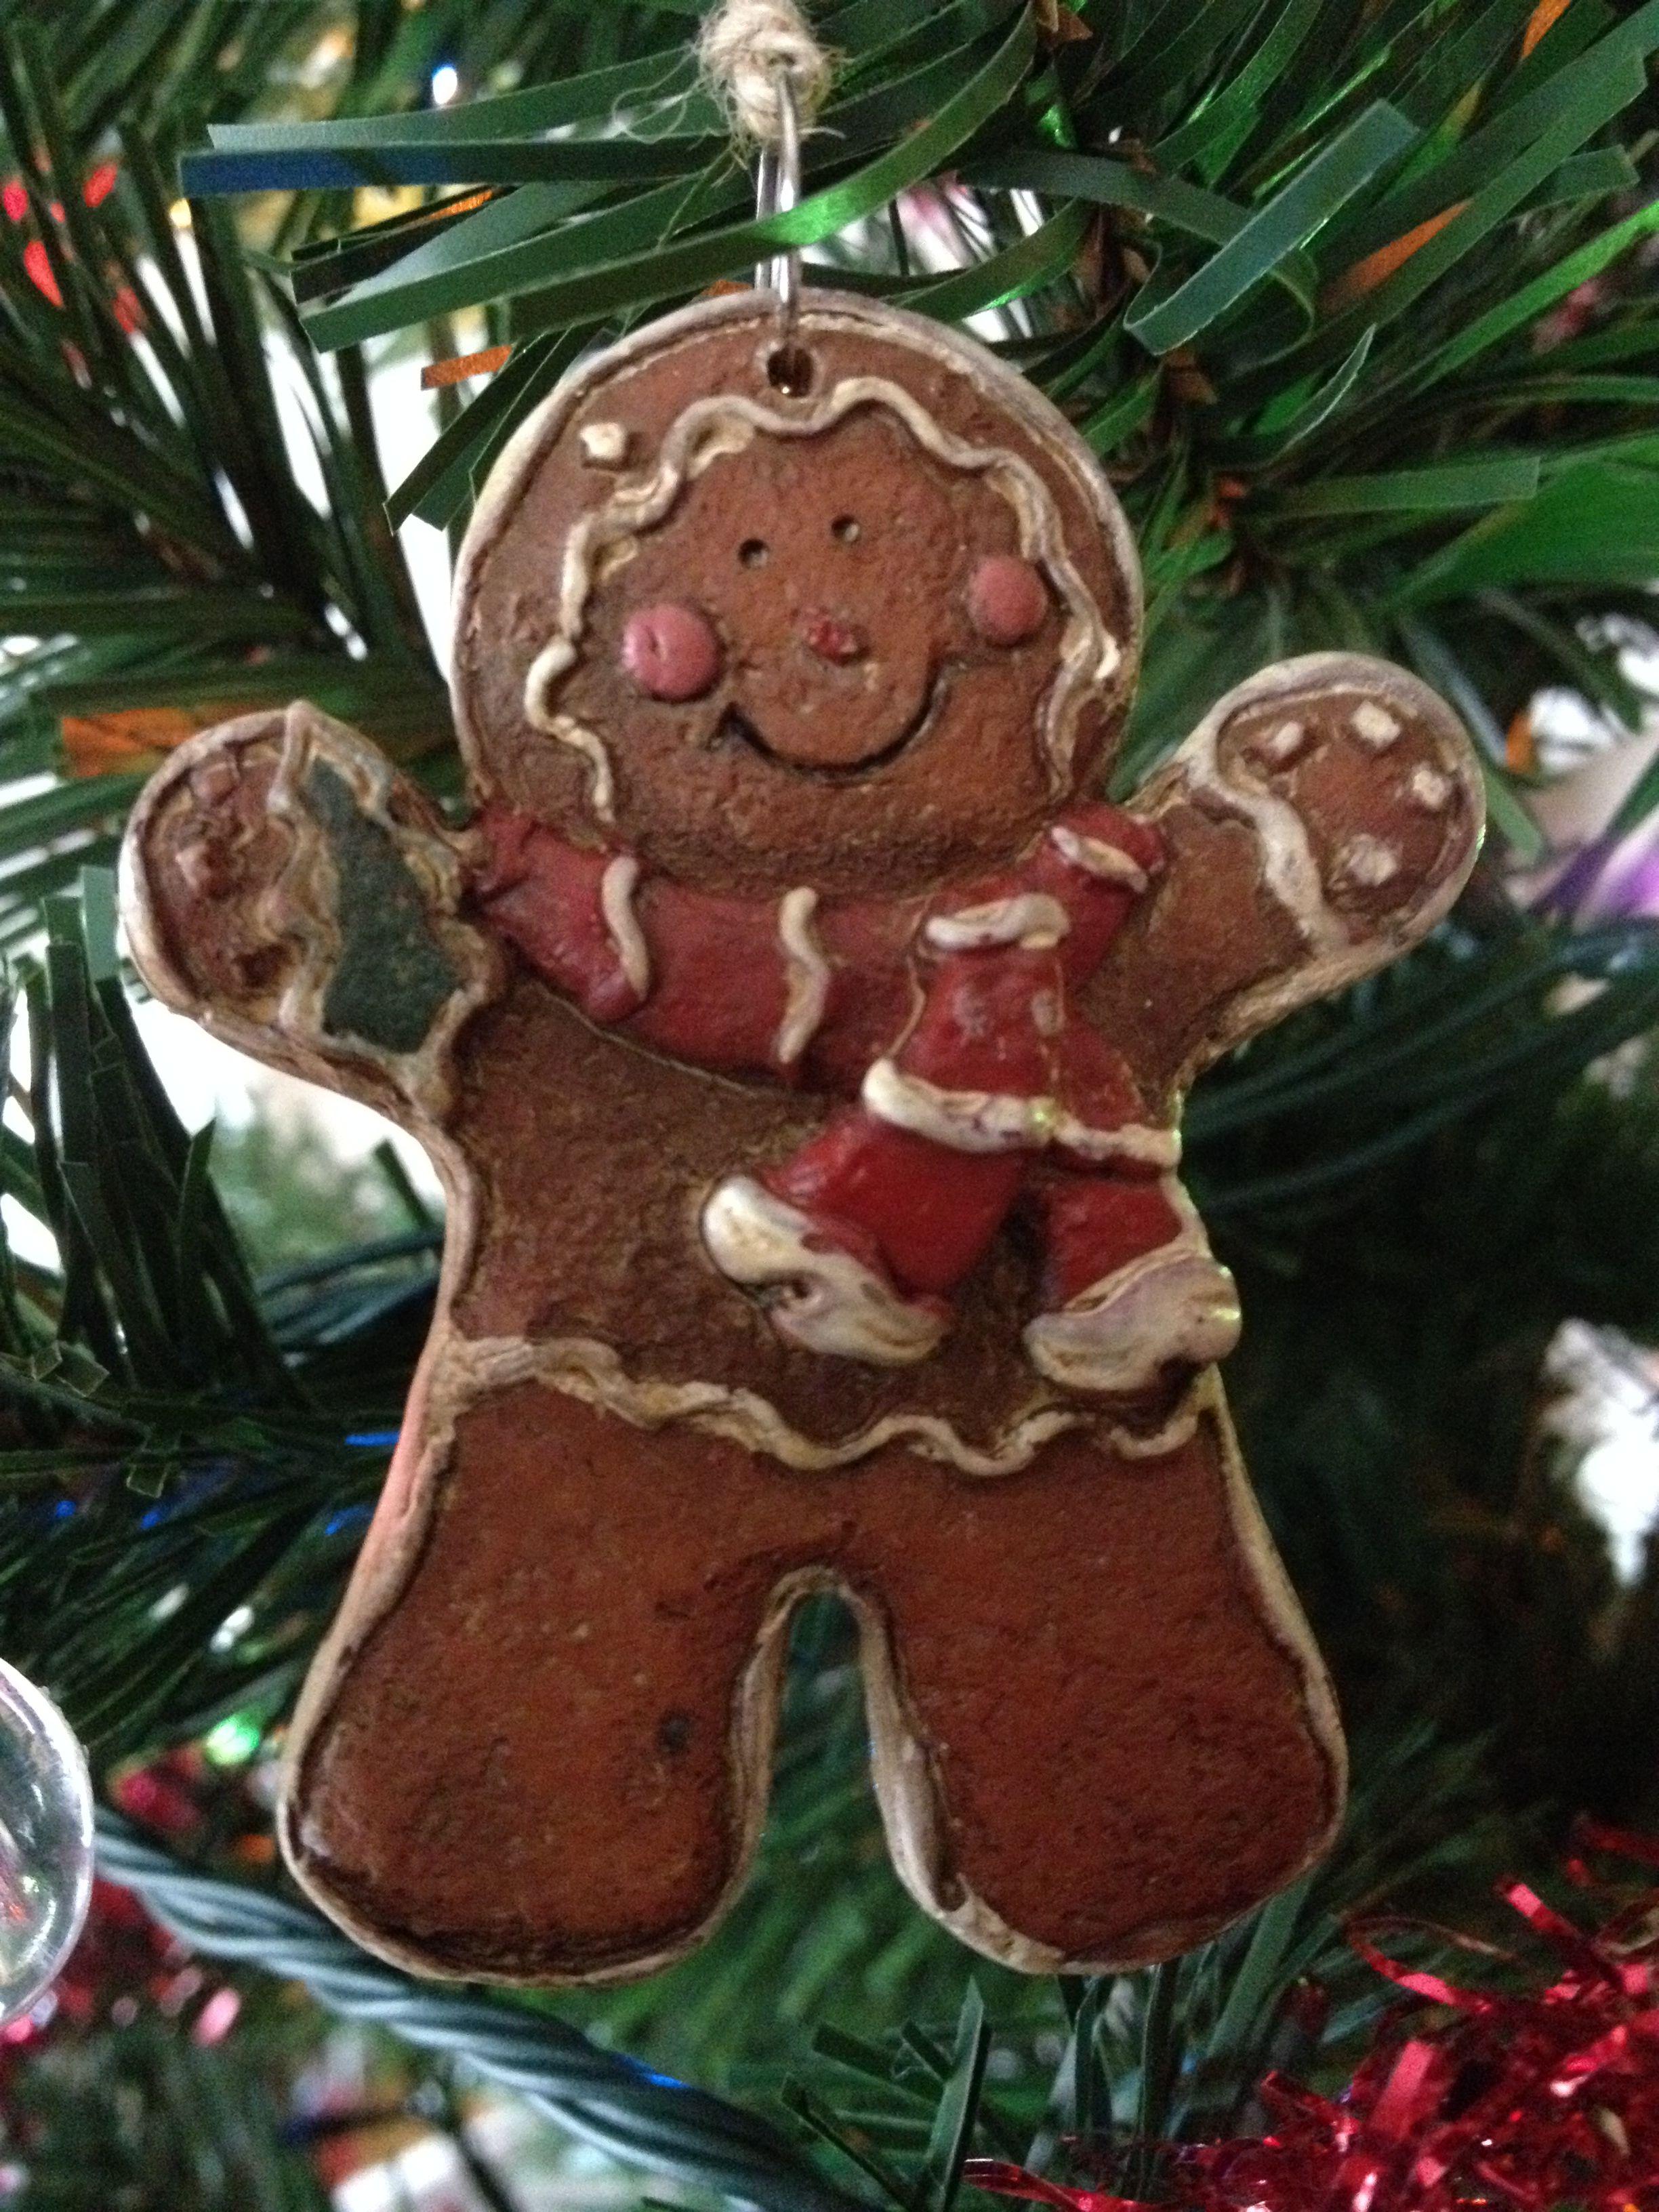 Chritsmas Tree Ornament from Oslo, Norway | Christmas Tree Ornaments ...